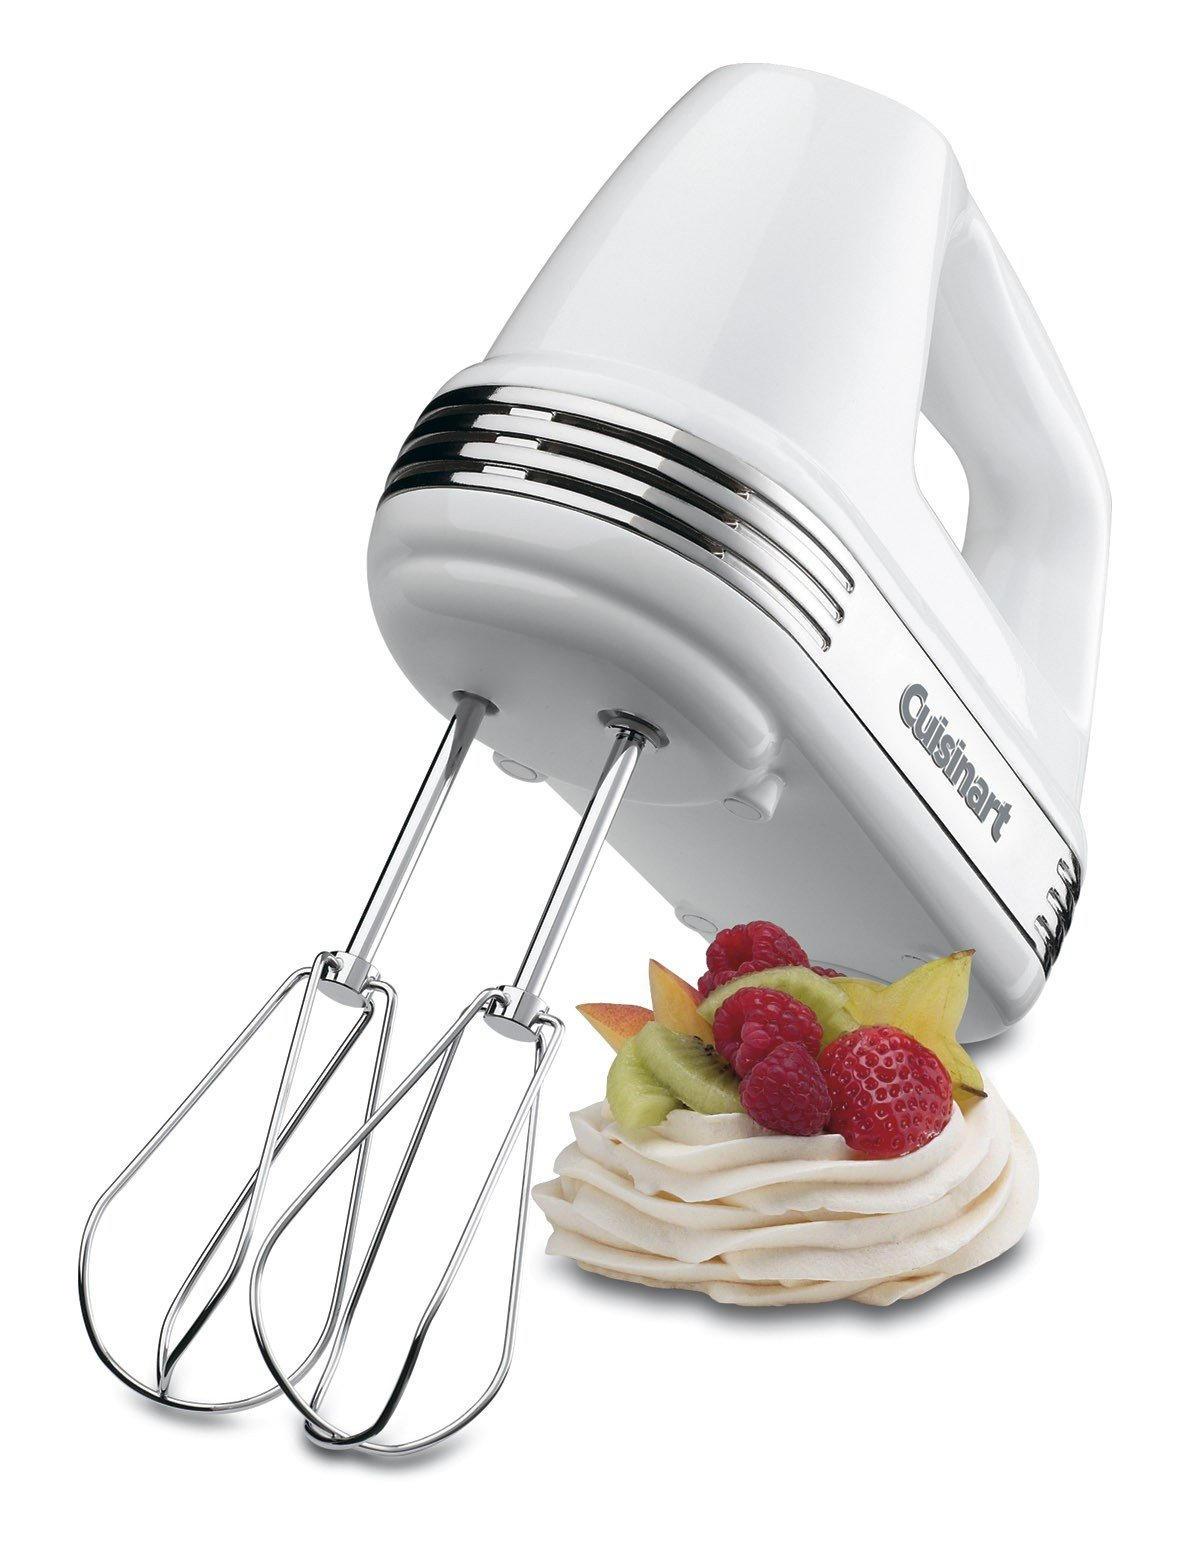 Cuisinart 7 Speed Hand Mixer, HM-70C